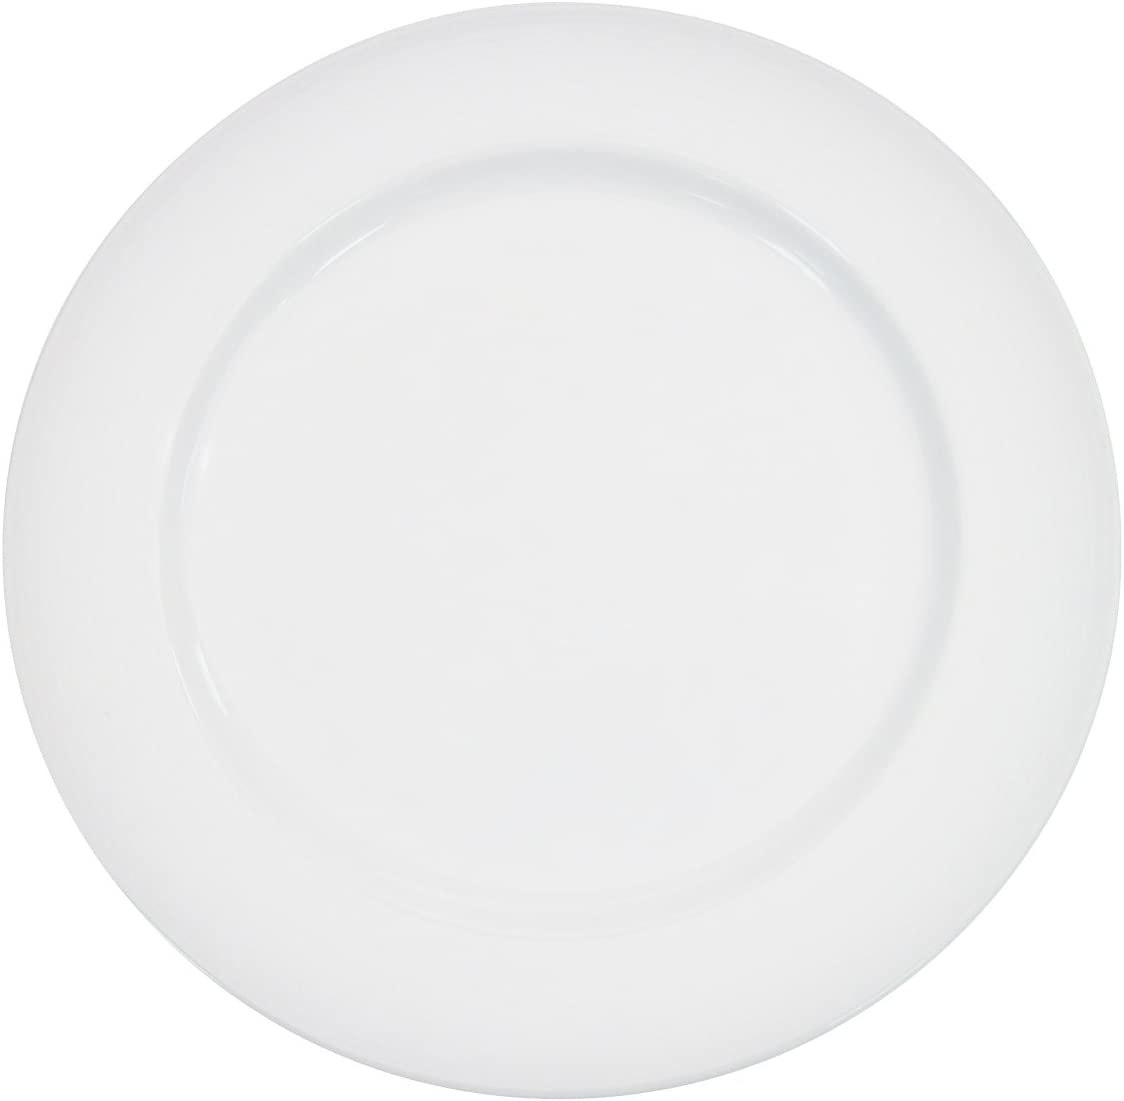 Save money CAC China HMY-6 6-1 4-Inch Harmony White Porcelain o Plate Very popular Box